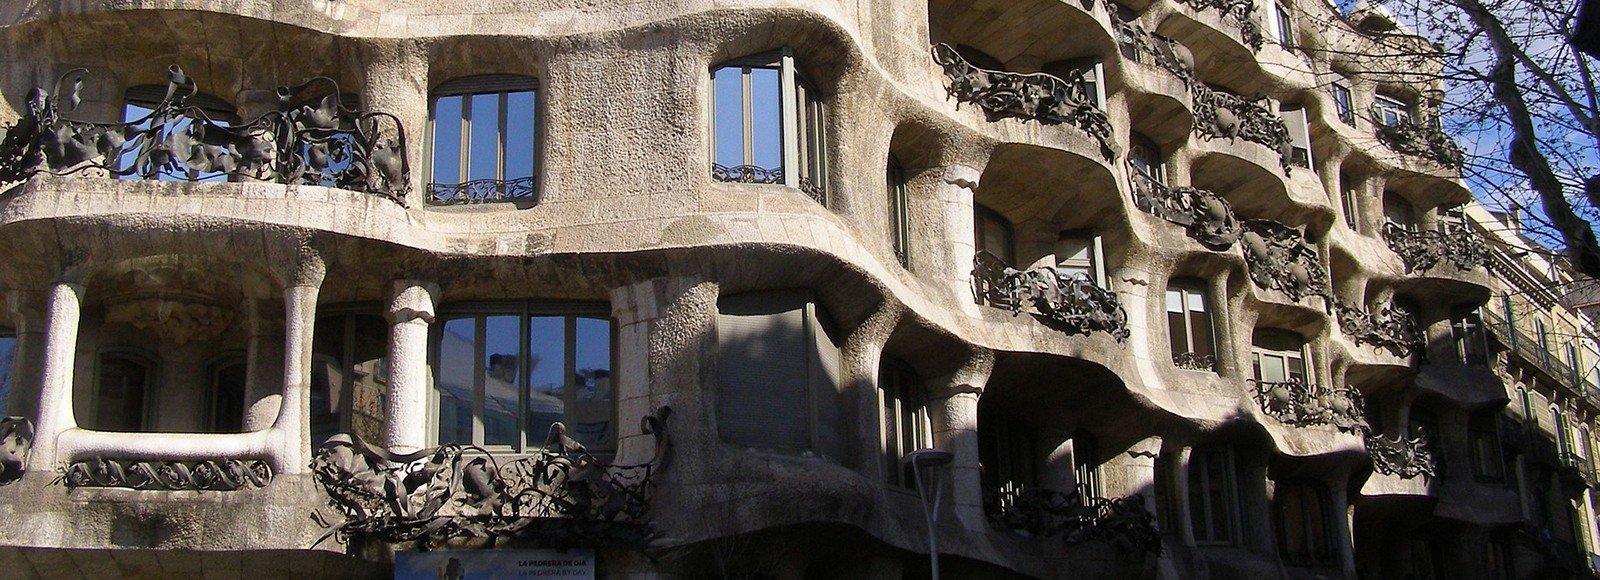 gaudi building barcelona spain